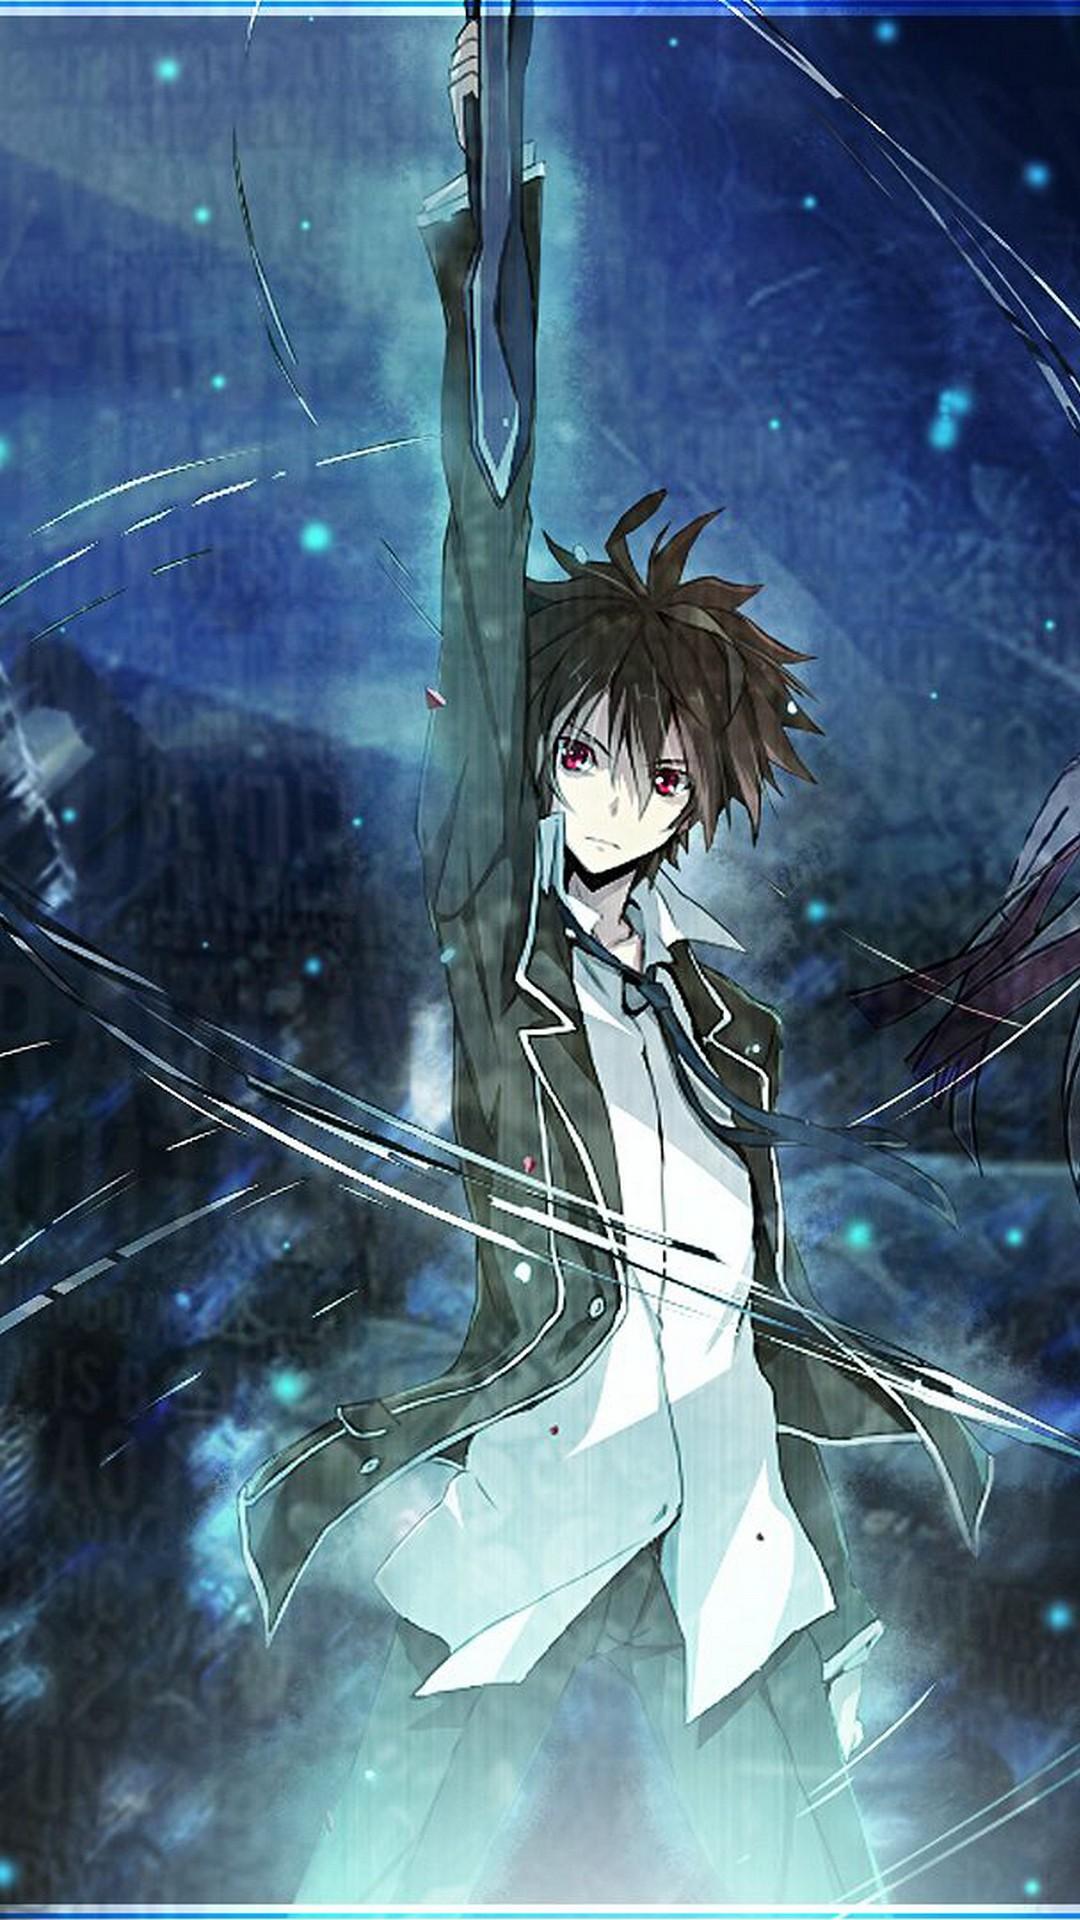 Anime Wallpaper 1366x768 : anime, wallpaper, 1366x768, Resolution, Anime, Wallpaper, Phone